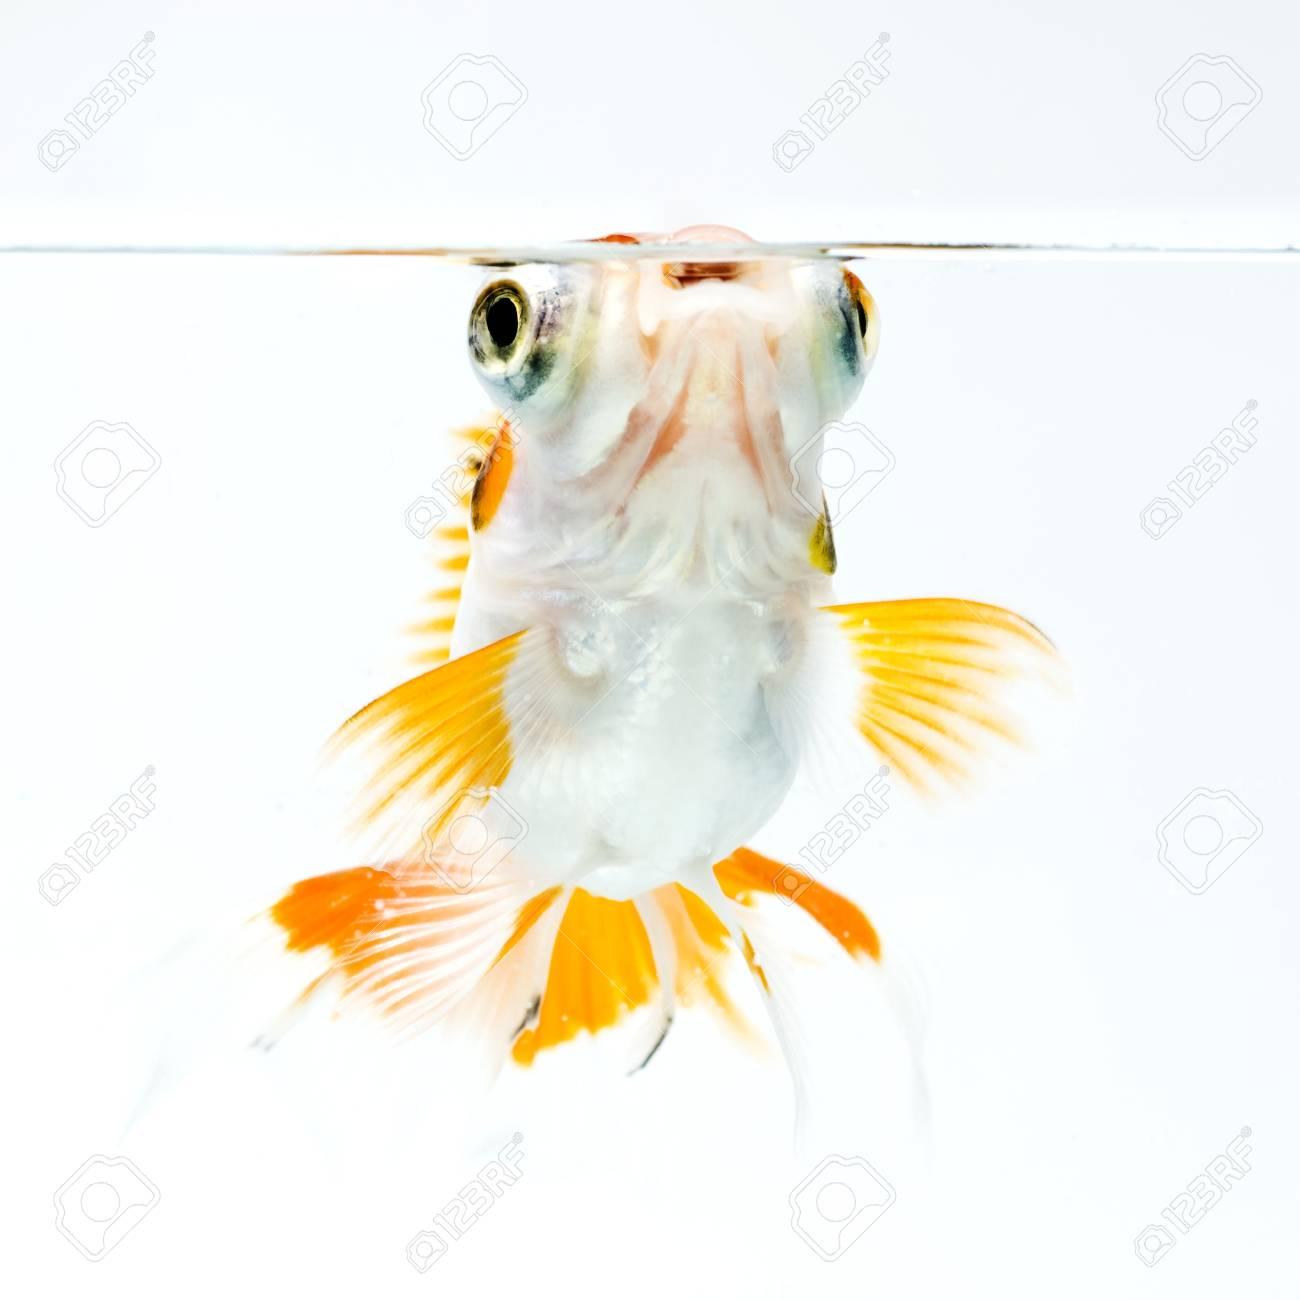 golden fish on white background Stock Photo - 11938465